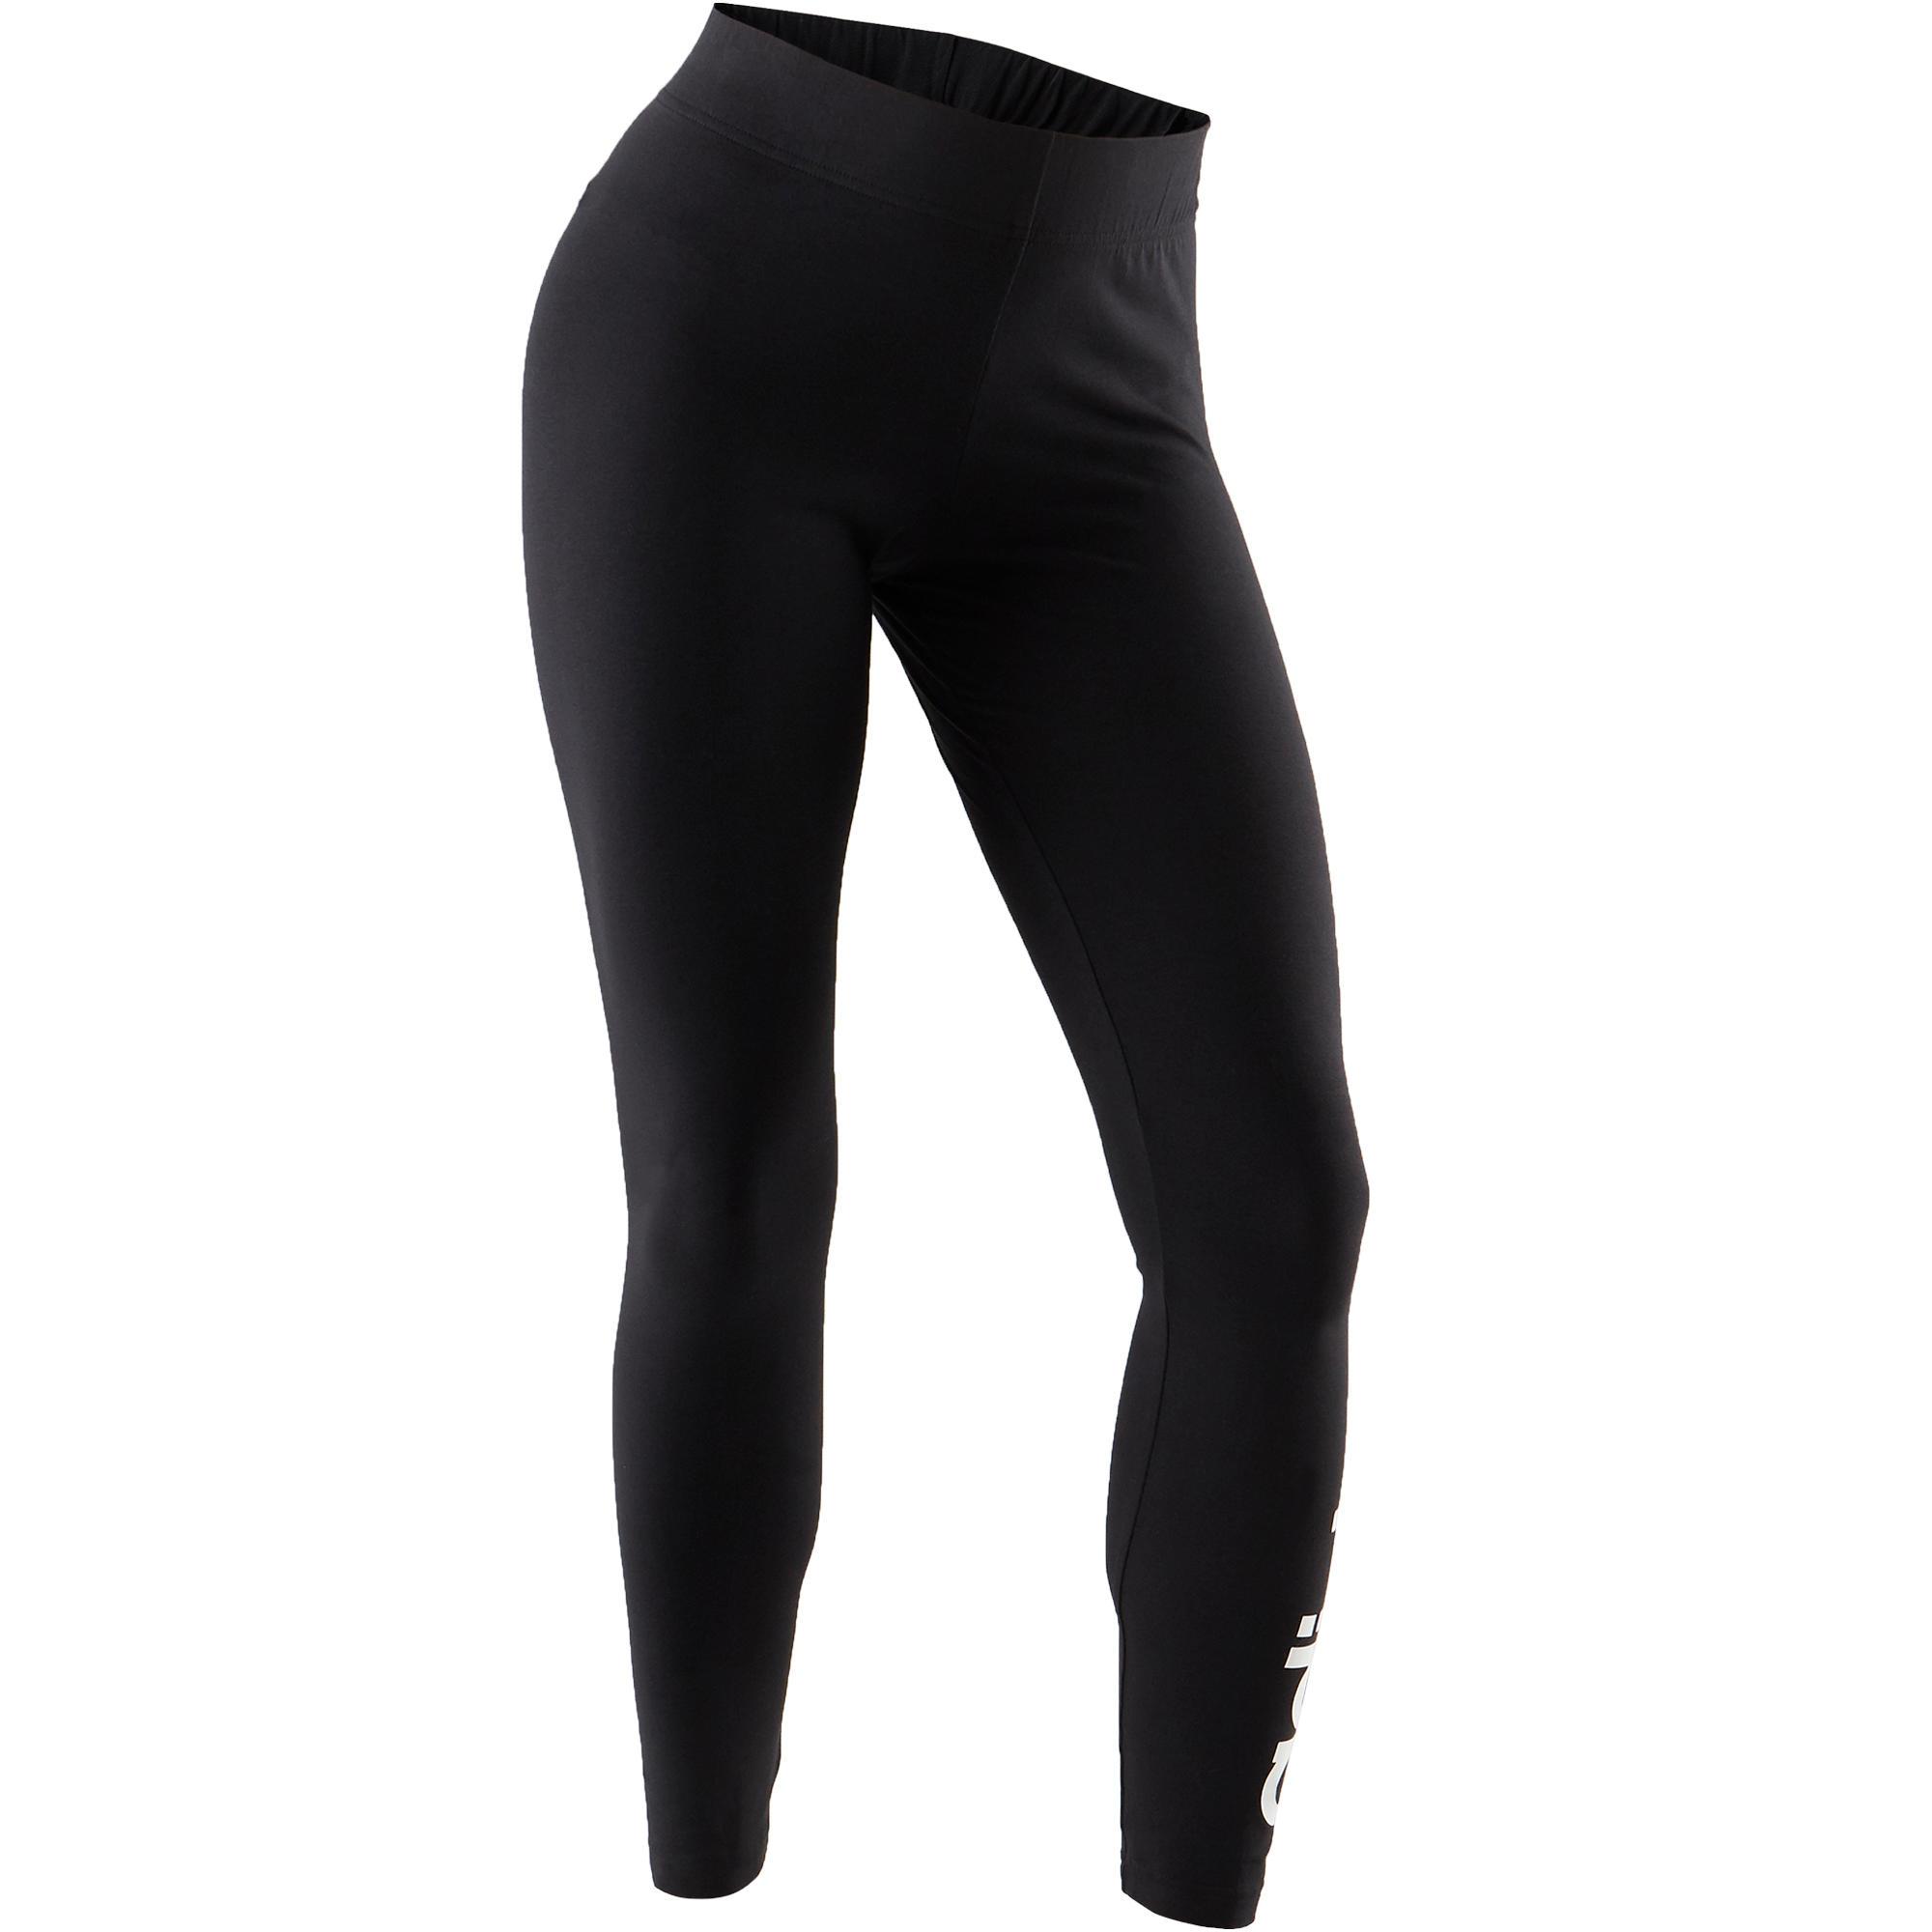 timeless design 2e692 c8c94 Adidas Legging Adidas Linear 500 Pilates Gym douce femme noirblanc   Decathlon